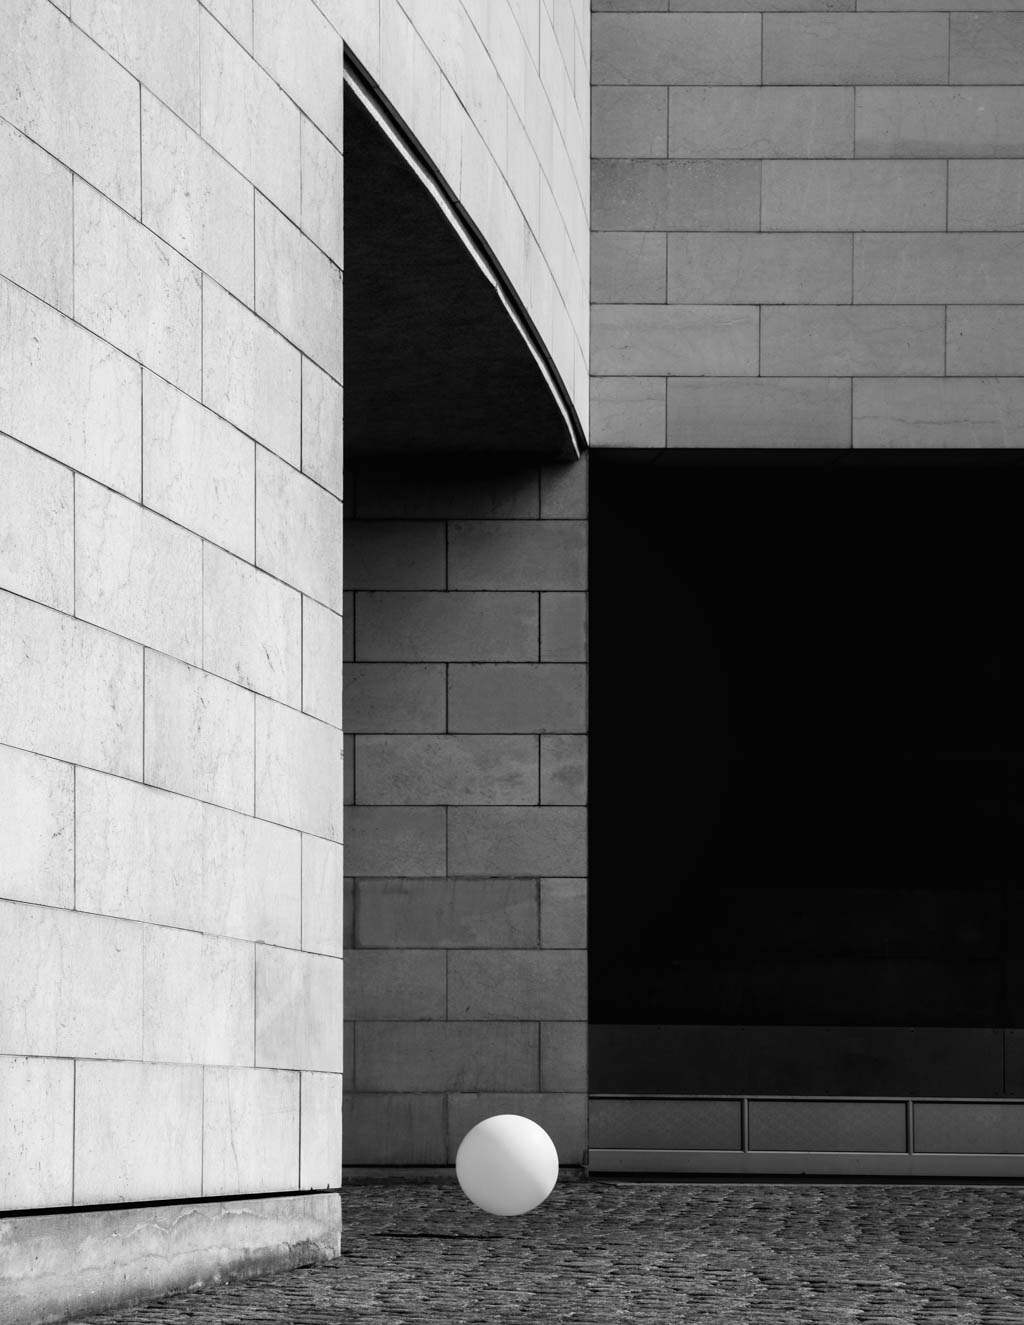 JonasBjerrePoulsen_WhiteSphere_Architectura_Web_1024x1325px